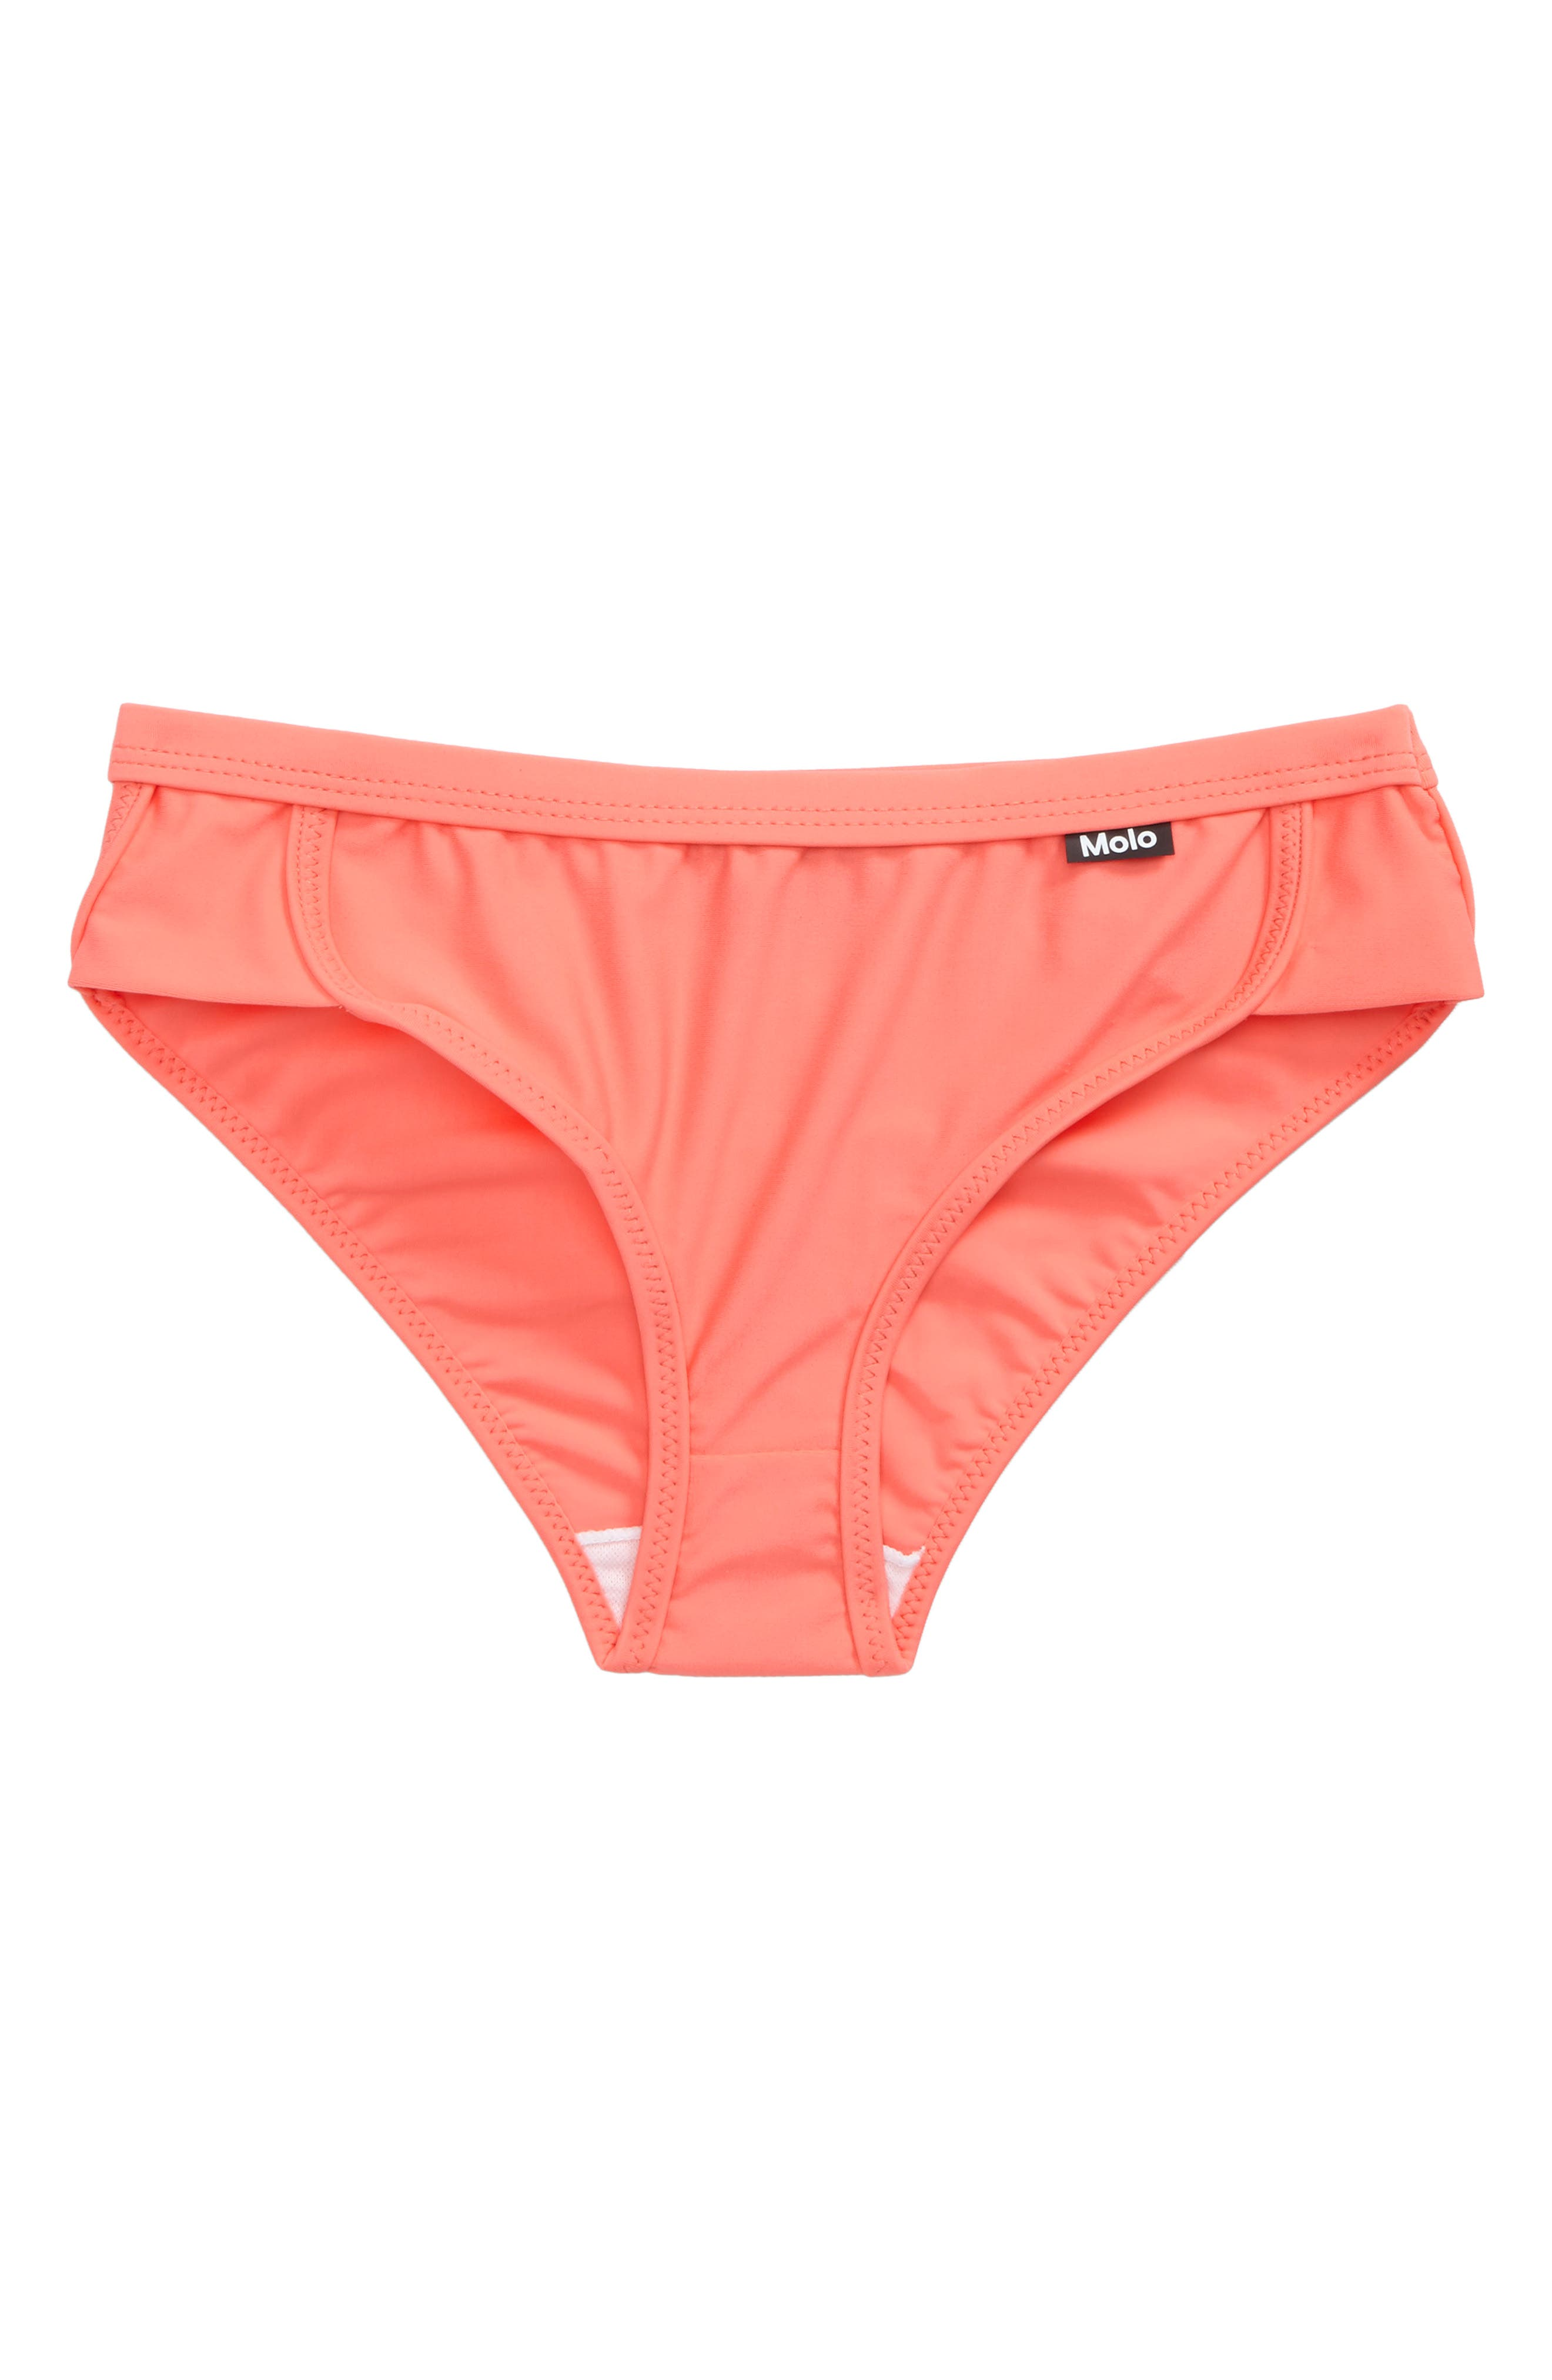 Nikki Bikini Bottoms,                         Main,                         color, Georgia Peach